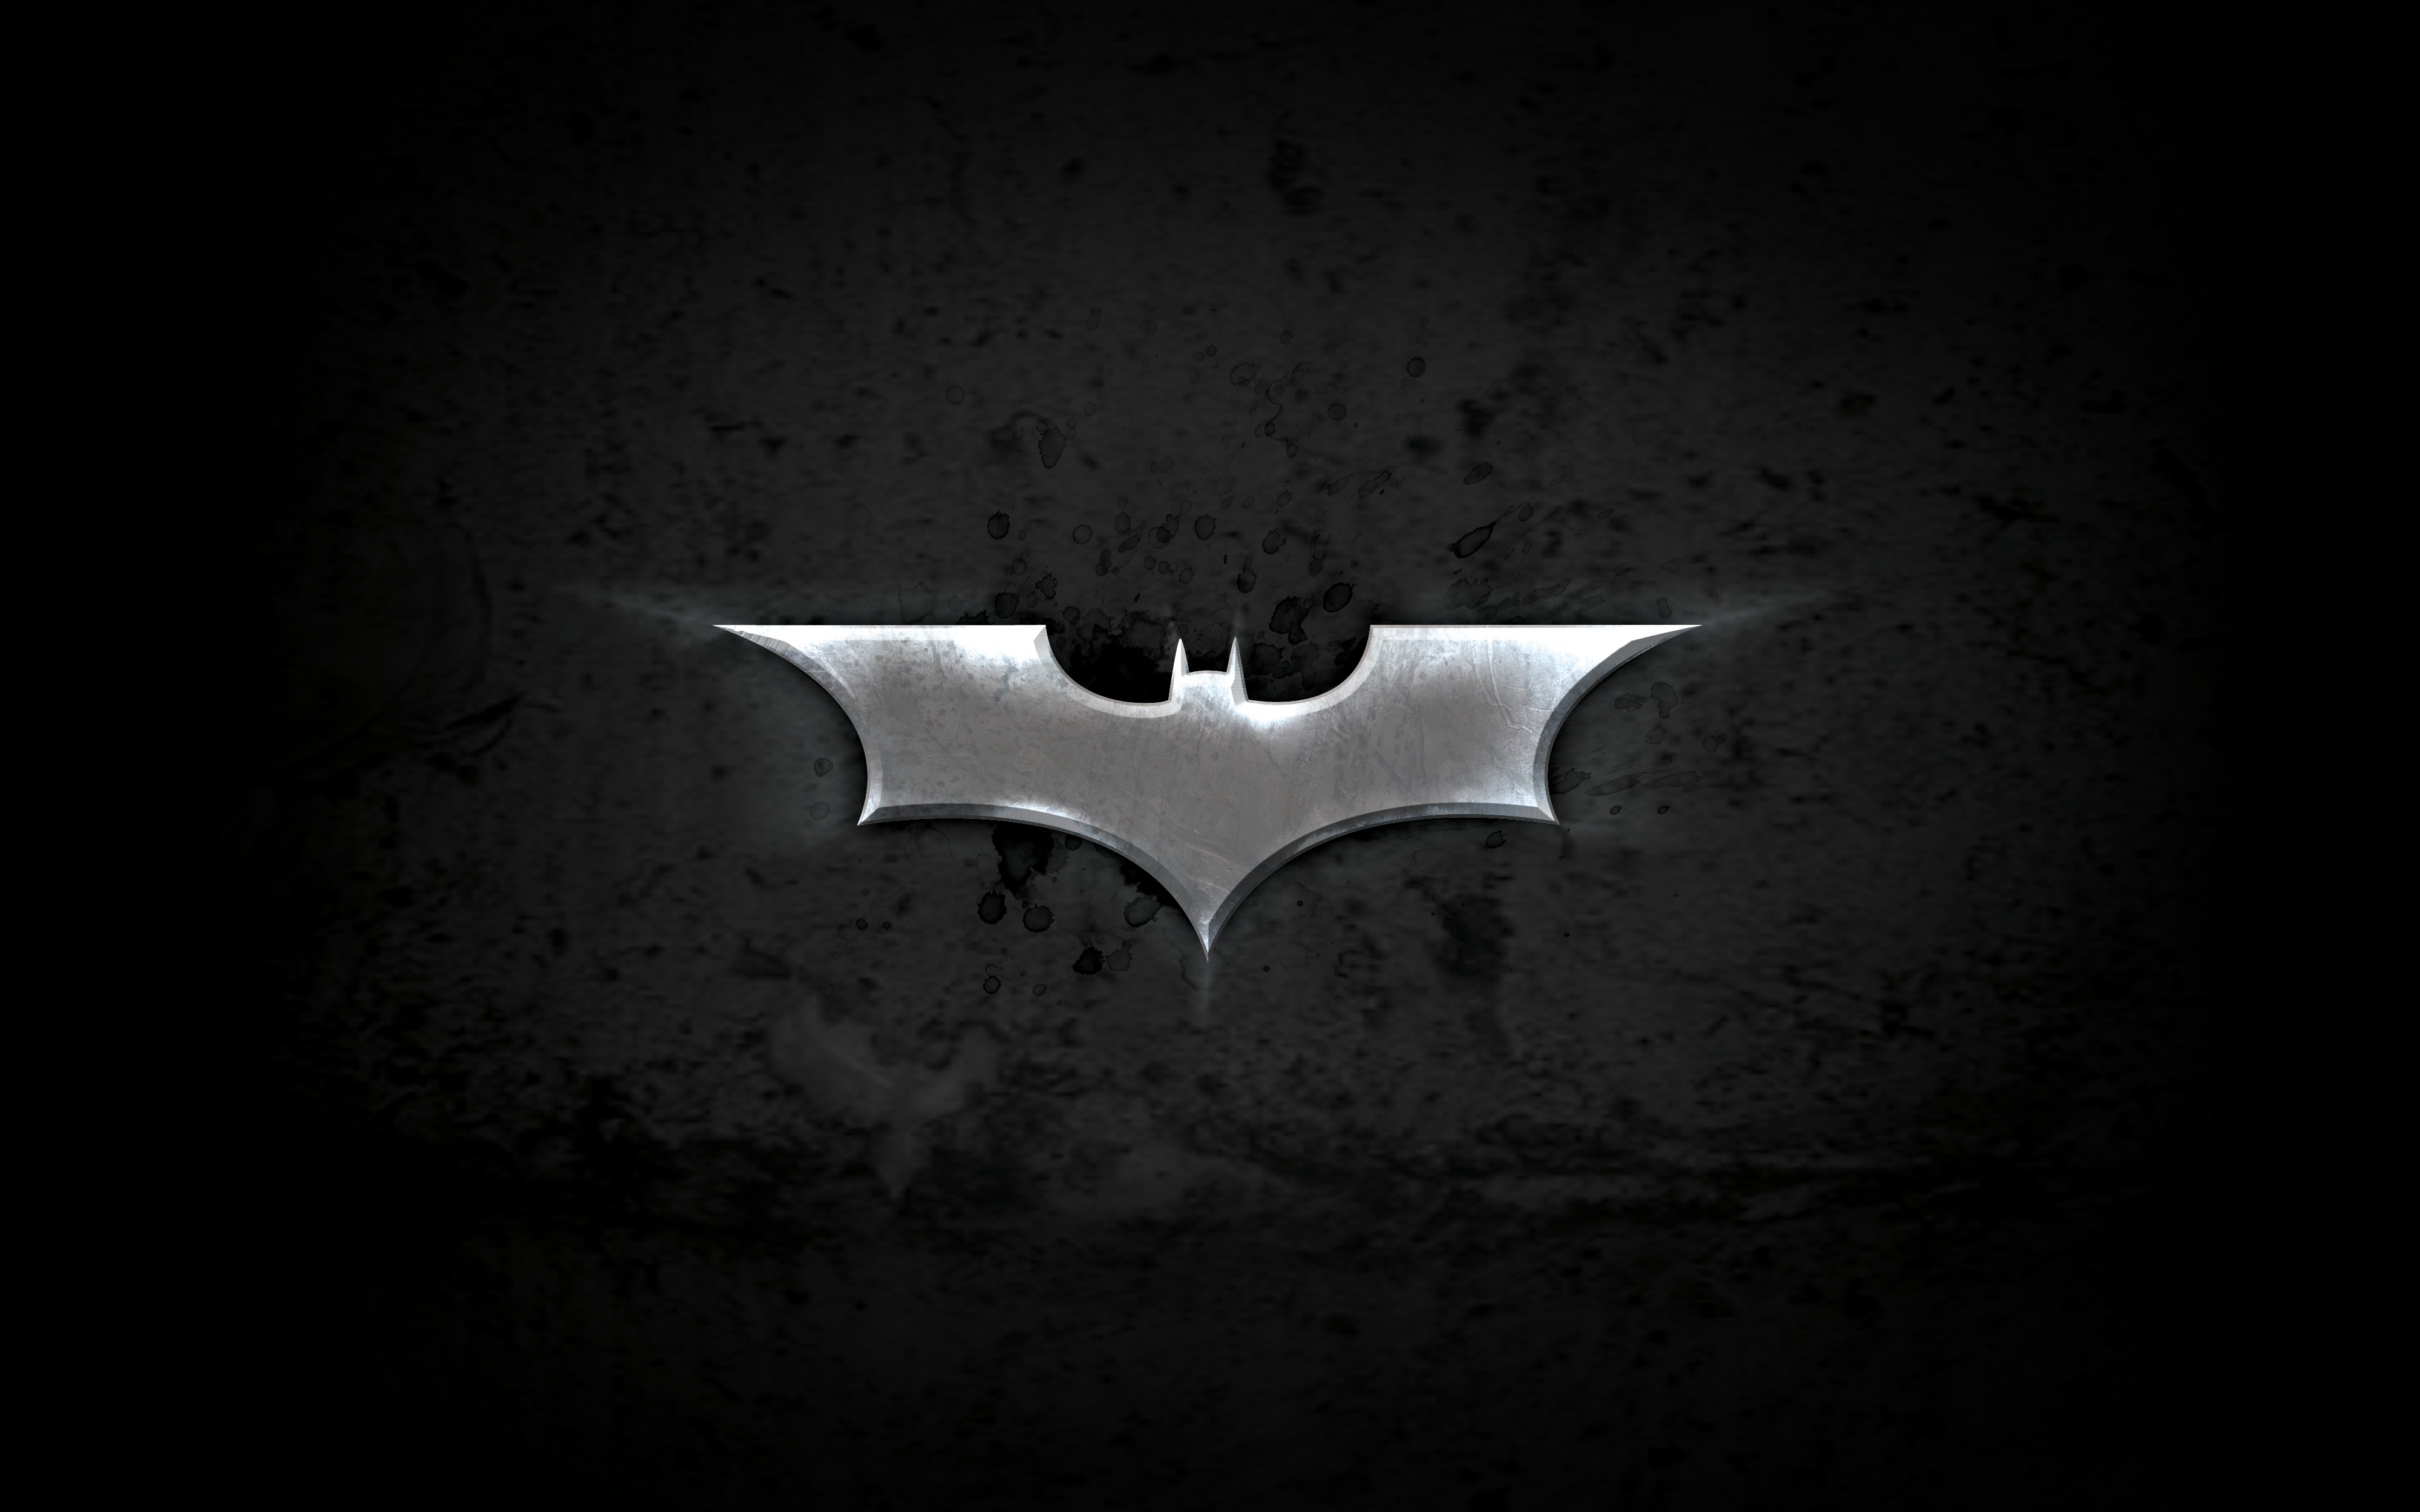 logo black backgrounds wallpapers cool cartoon photo batman wallpaper 4000x2500